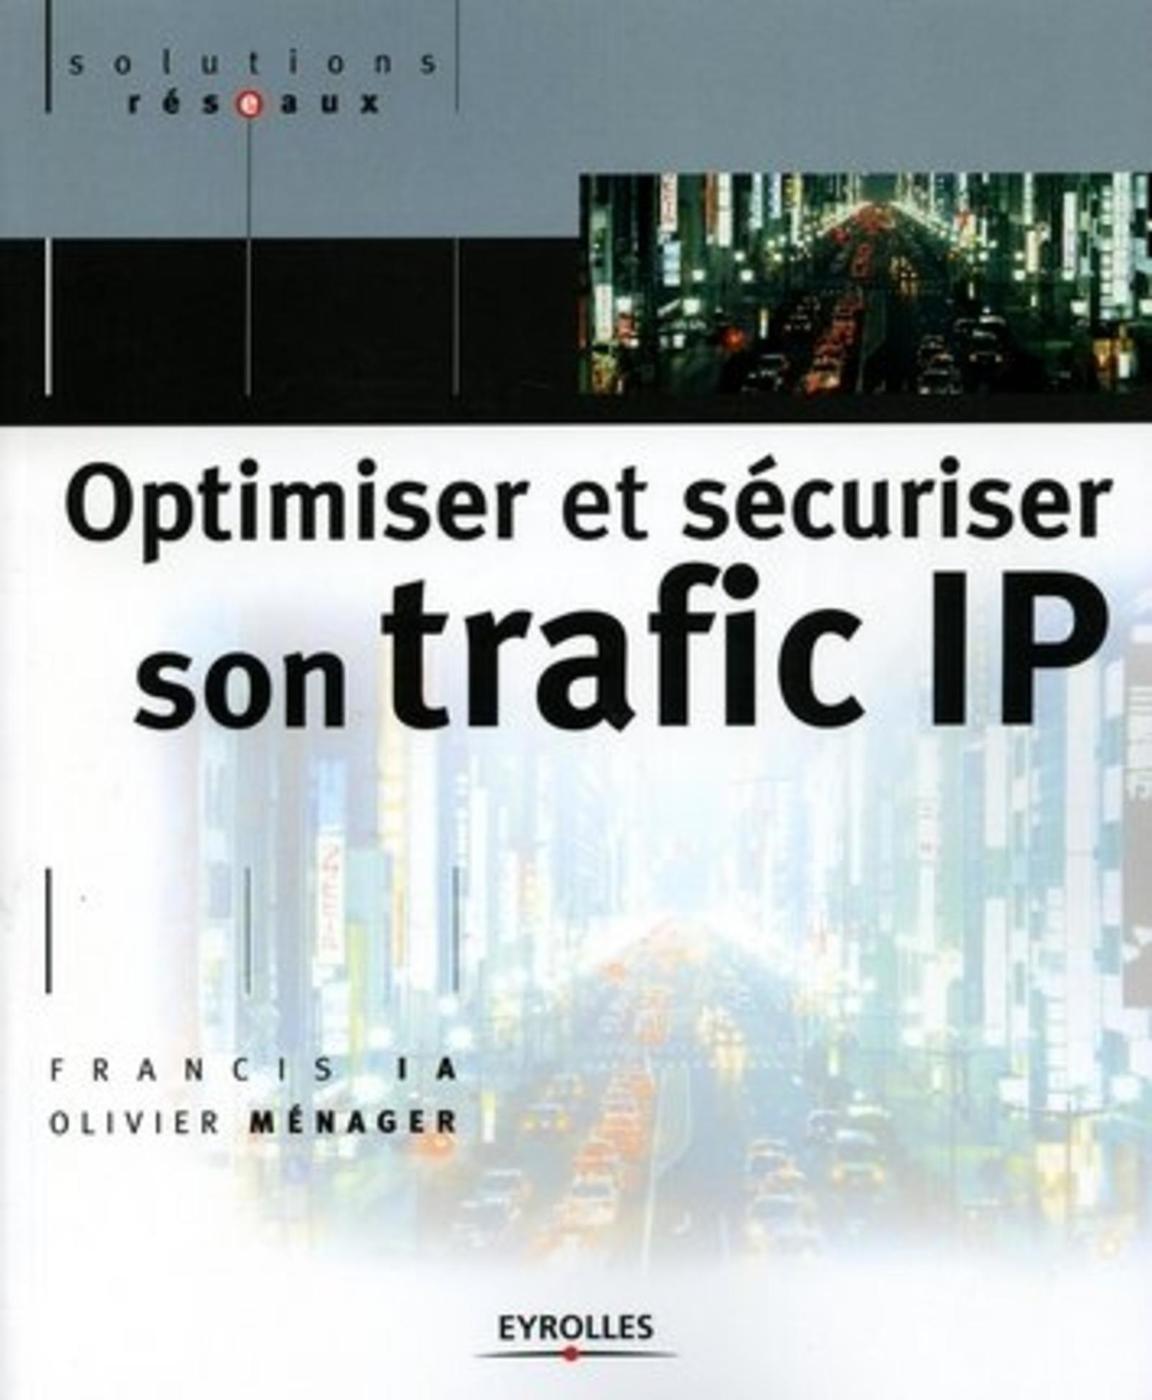 Optimiser et sécuriser son trafic IP - Francis Ia, Olivier Ménager -  Librairie Eyrolles